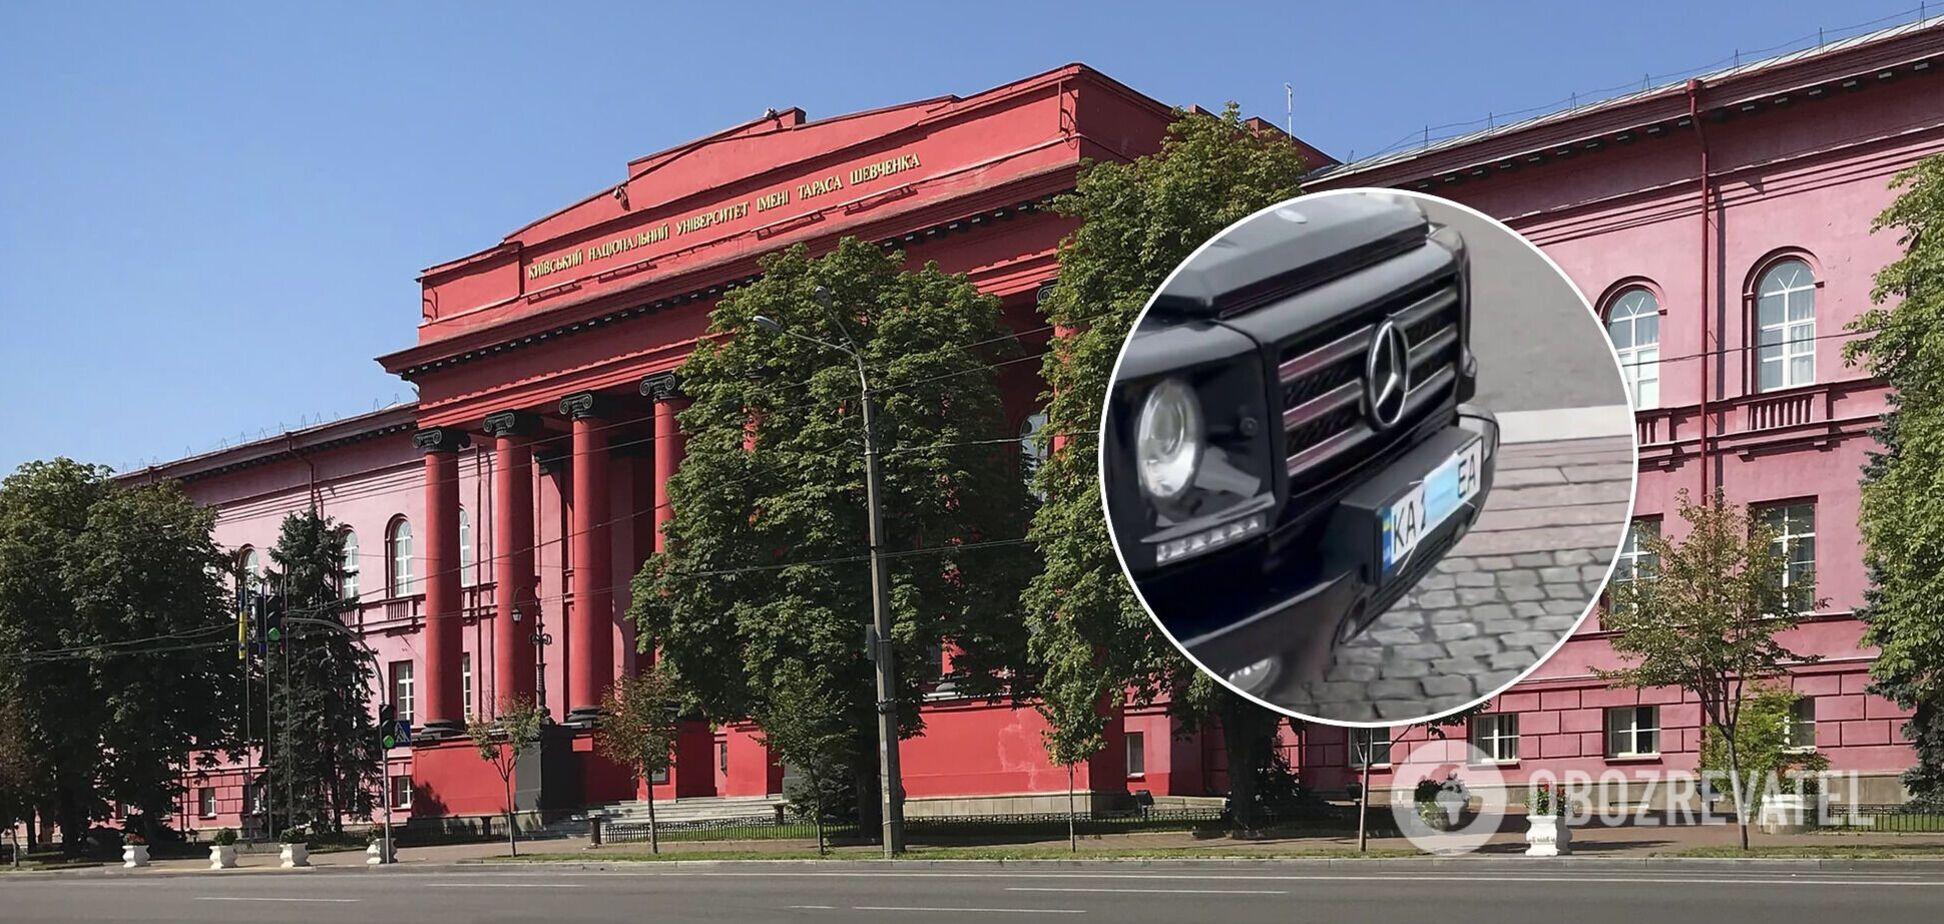 Машину заметили возле красного корпуса университета Шевченко